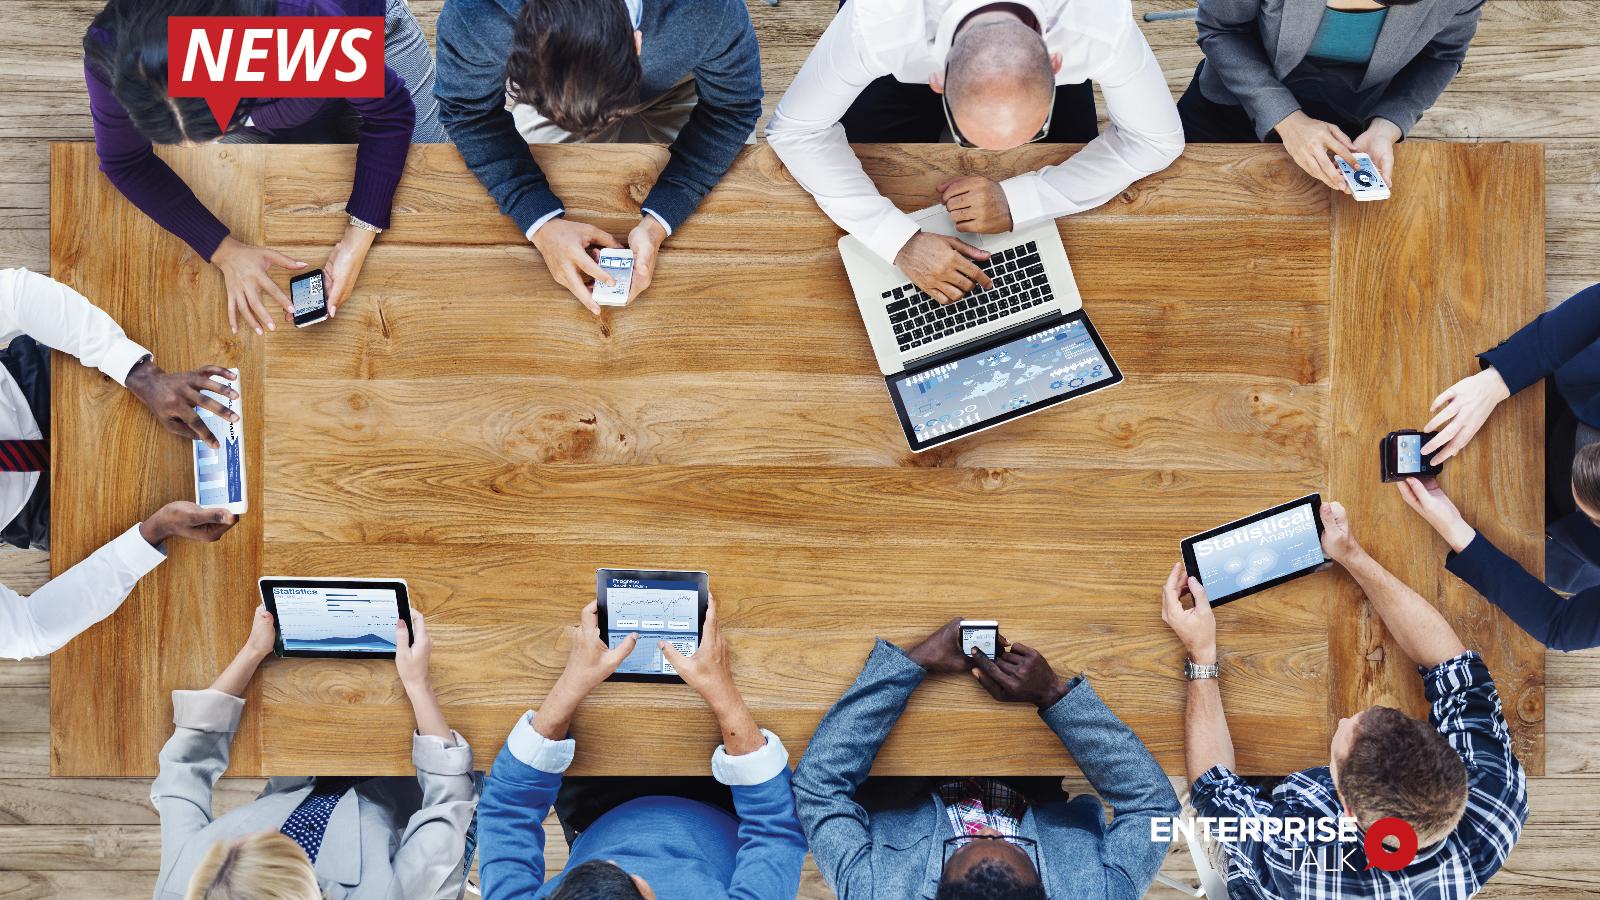 digital transformation , DOMO, mobile devices, C-Suite leaders, business data